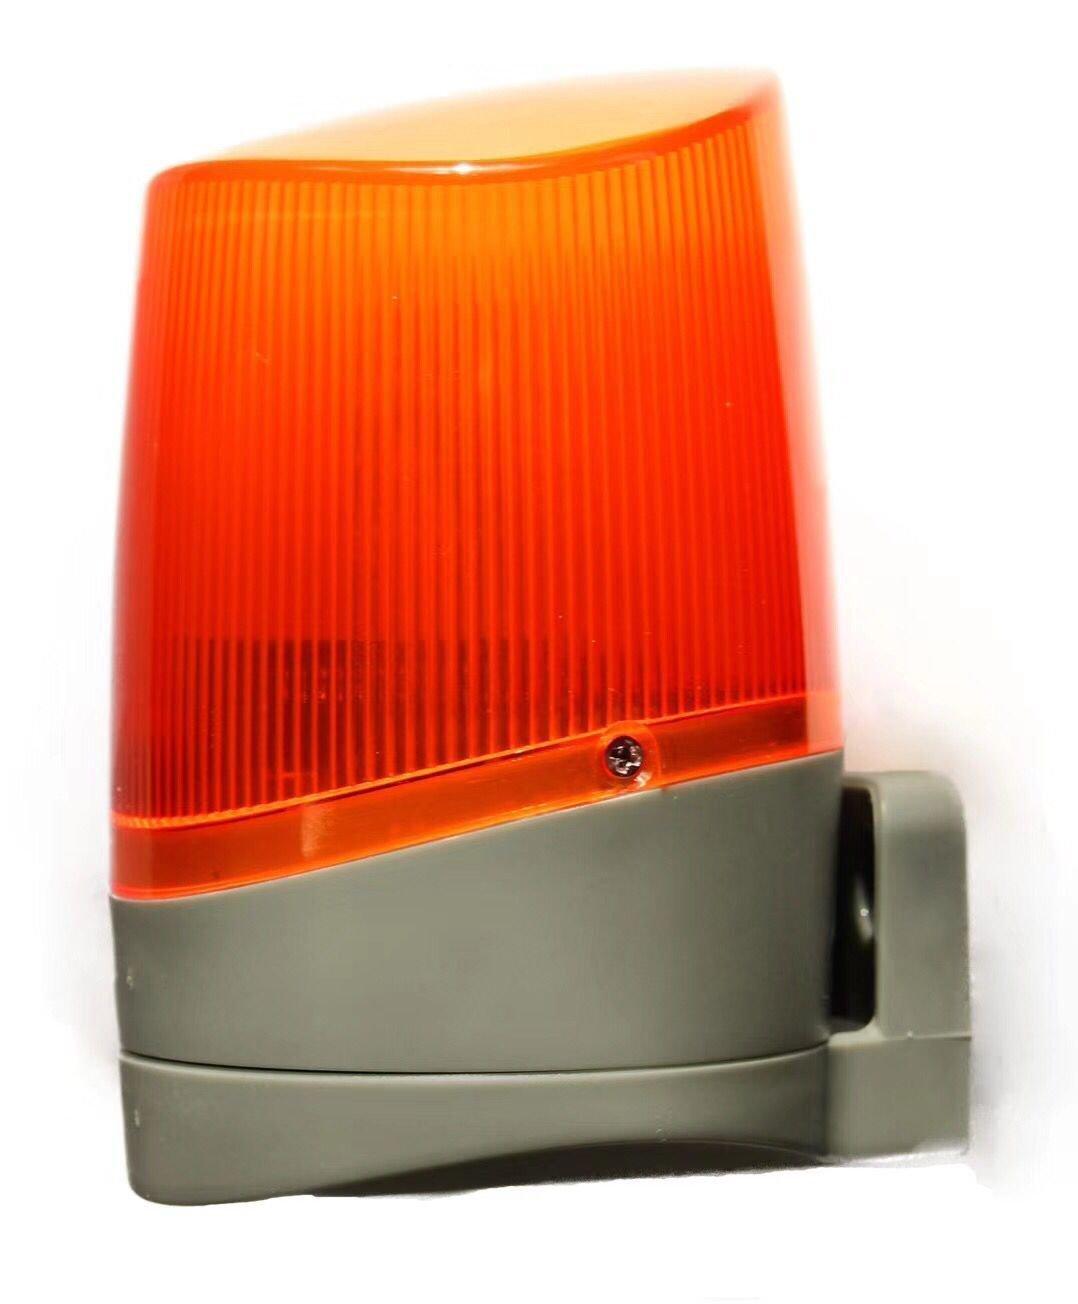 NSEE G5001R 220V AC LED Bulb Gate Opener Strobe Flash Lamp Light Wall Mounted